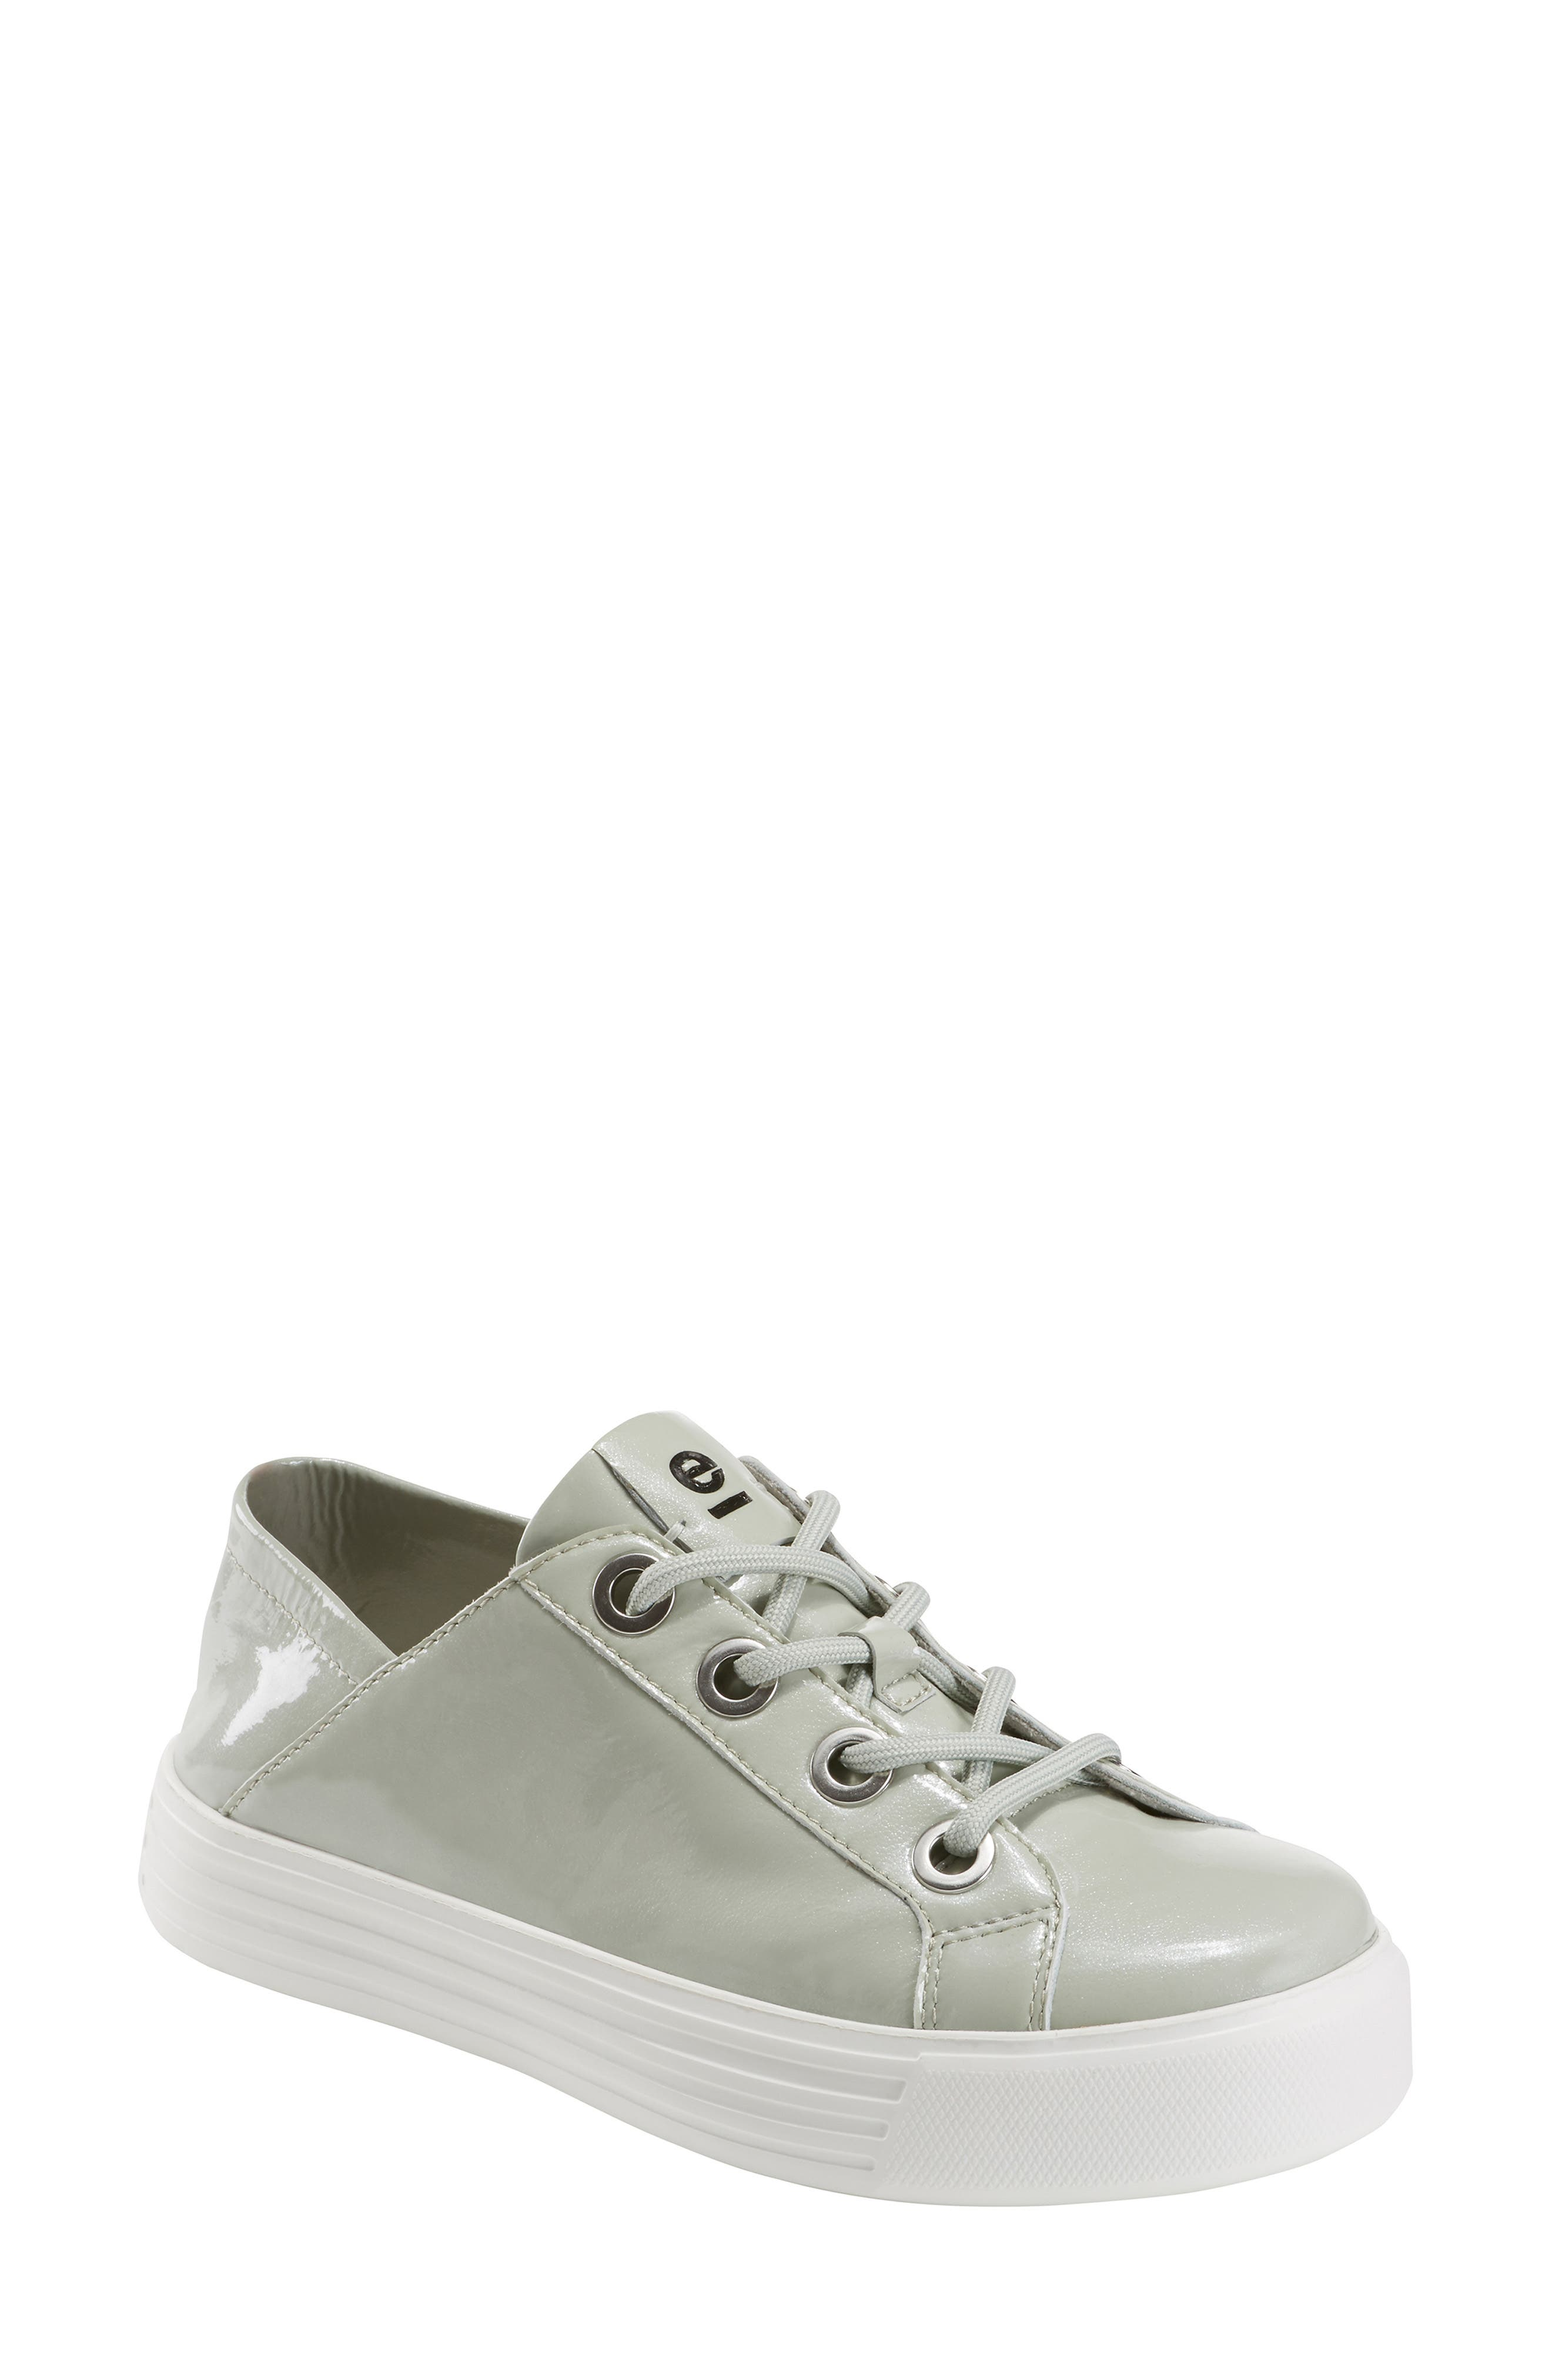 Earth Cedarwood Convertible Sneaker, Green